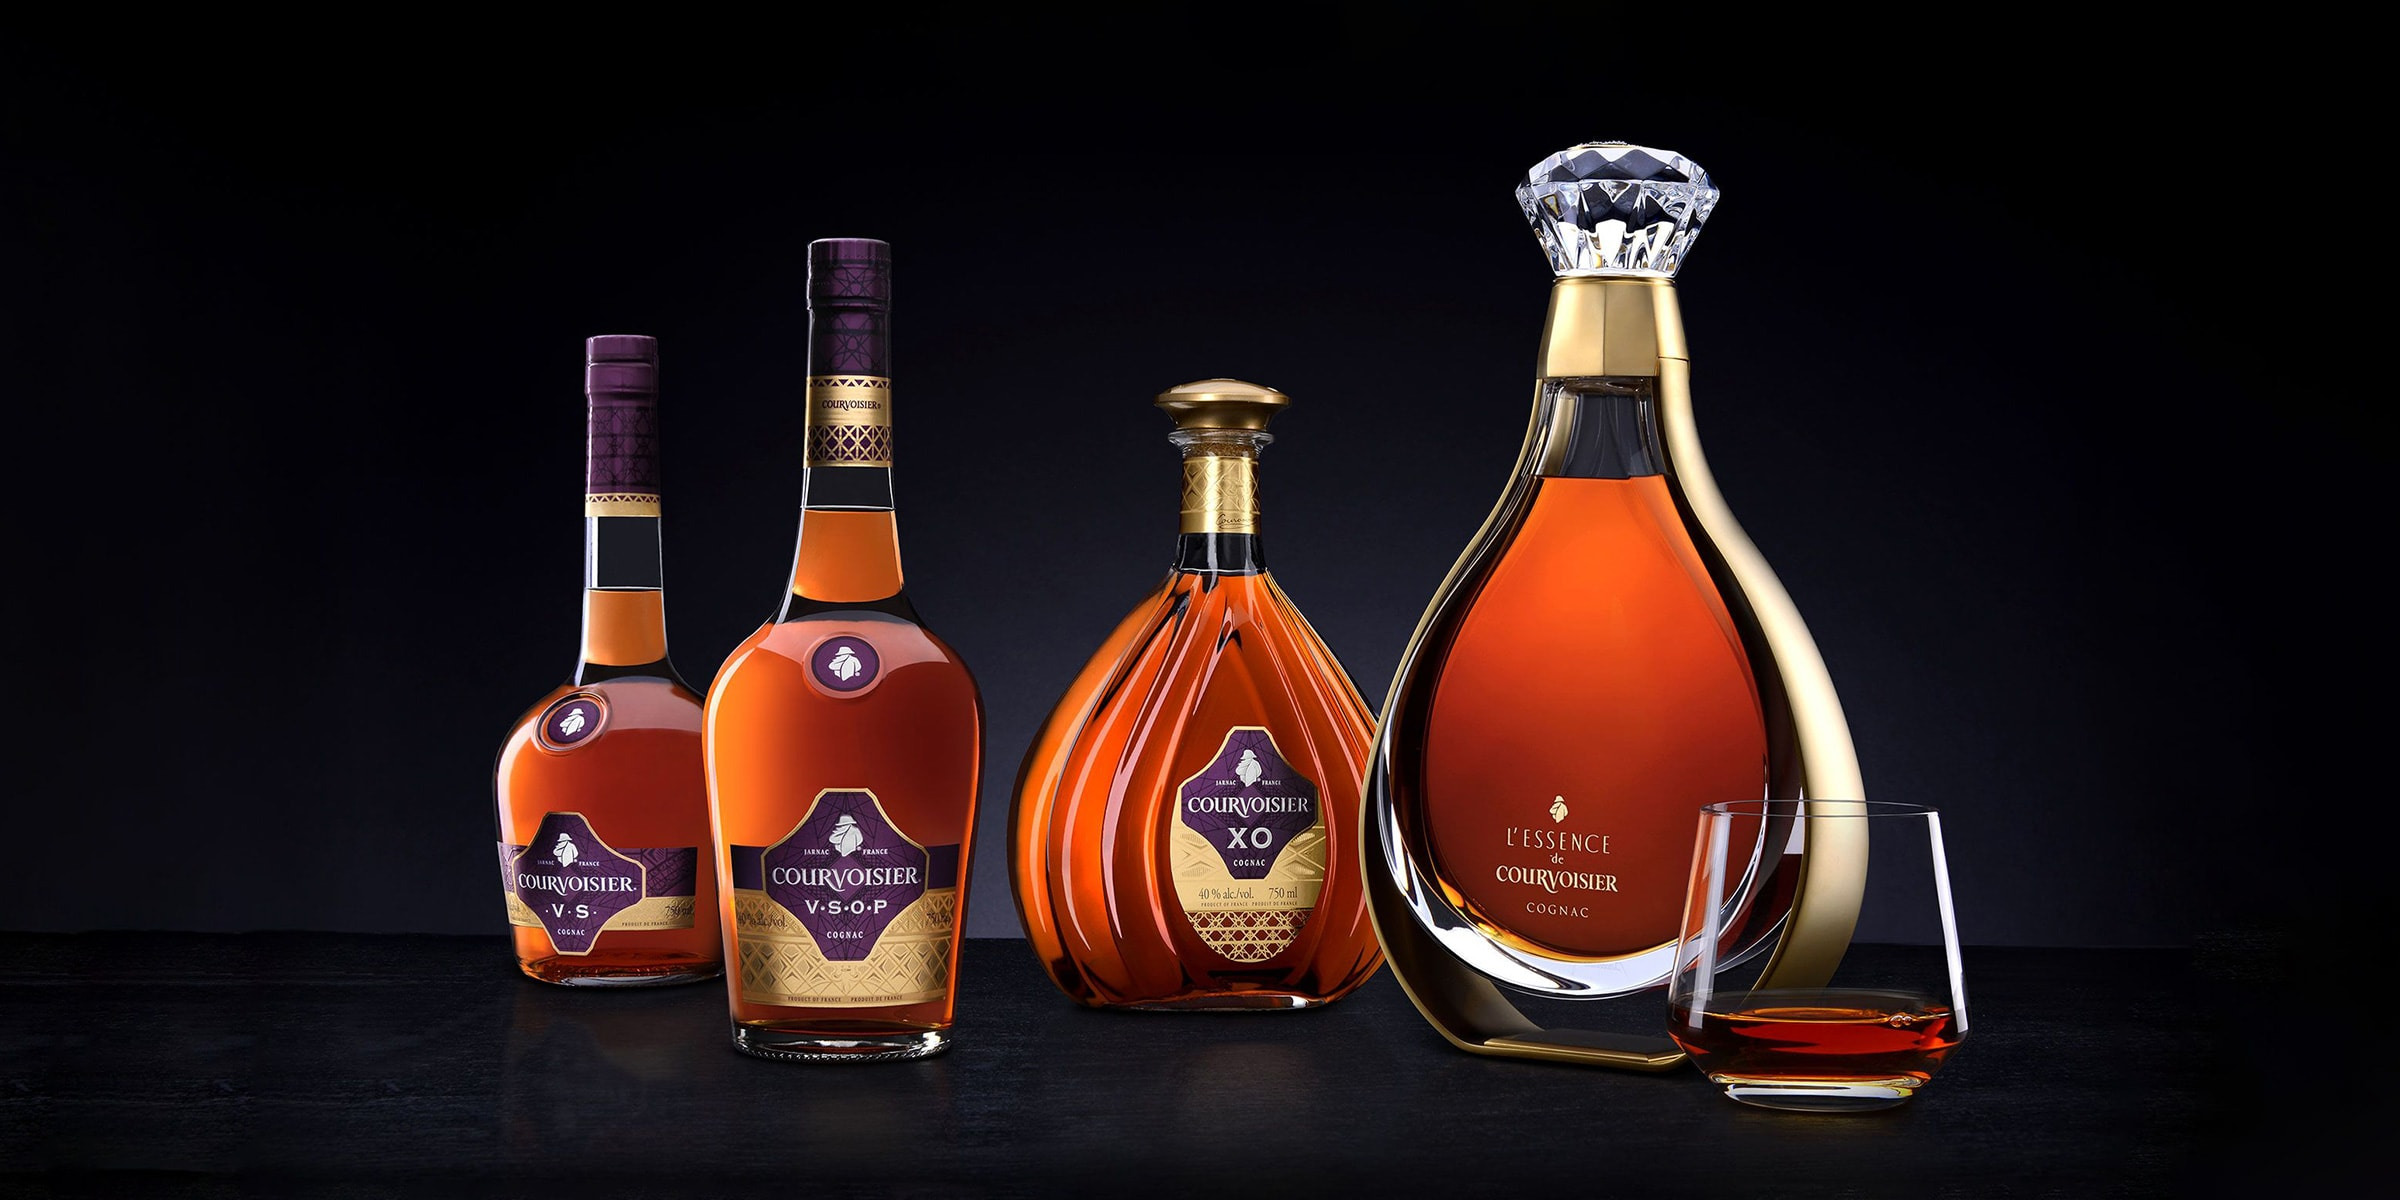 courvoisier cognac bottle price size review - Luxe Digital